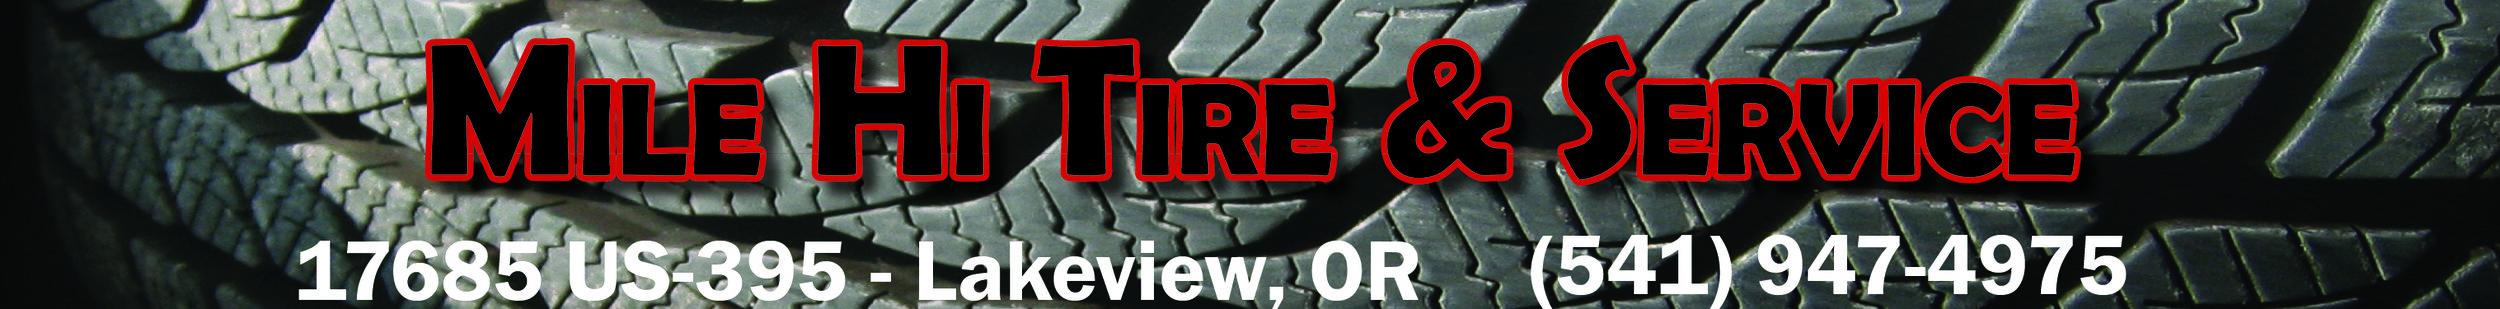 Mile Hi Tire_Directory Cover.jpg